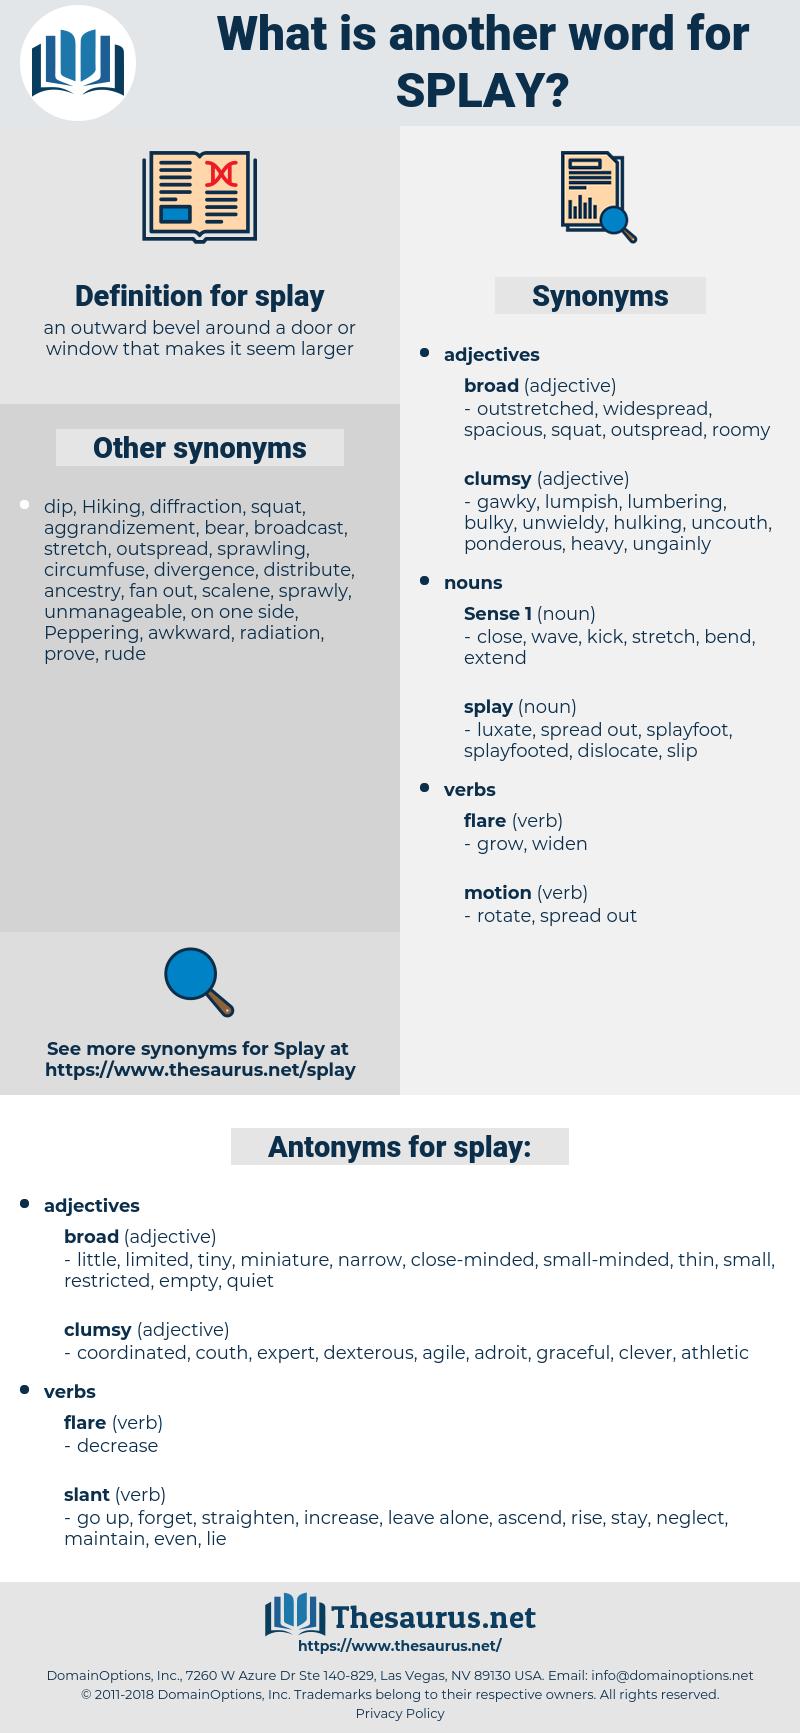 splay, synonym splay, another word for splay, words like splay, thesaurus splay